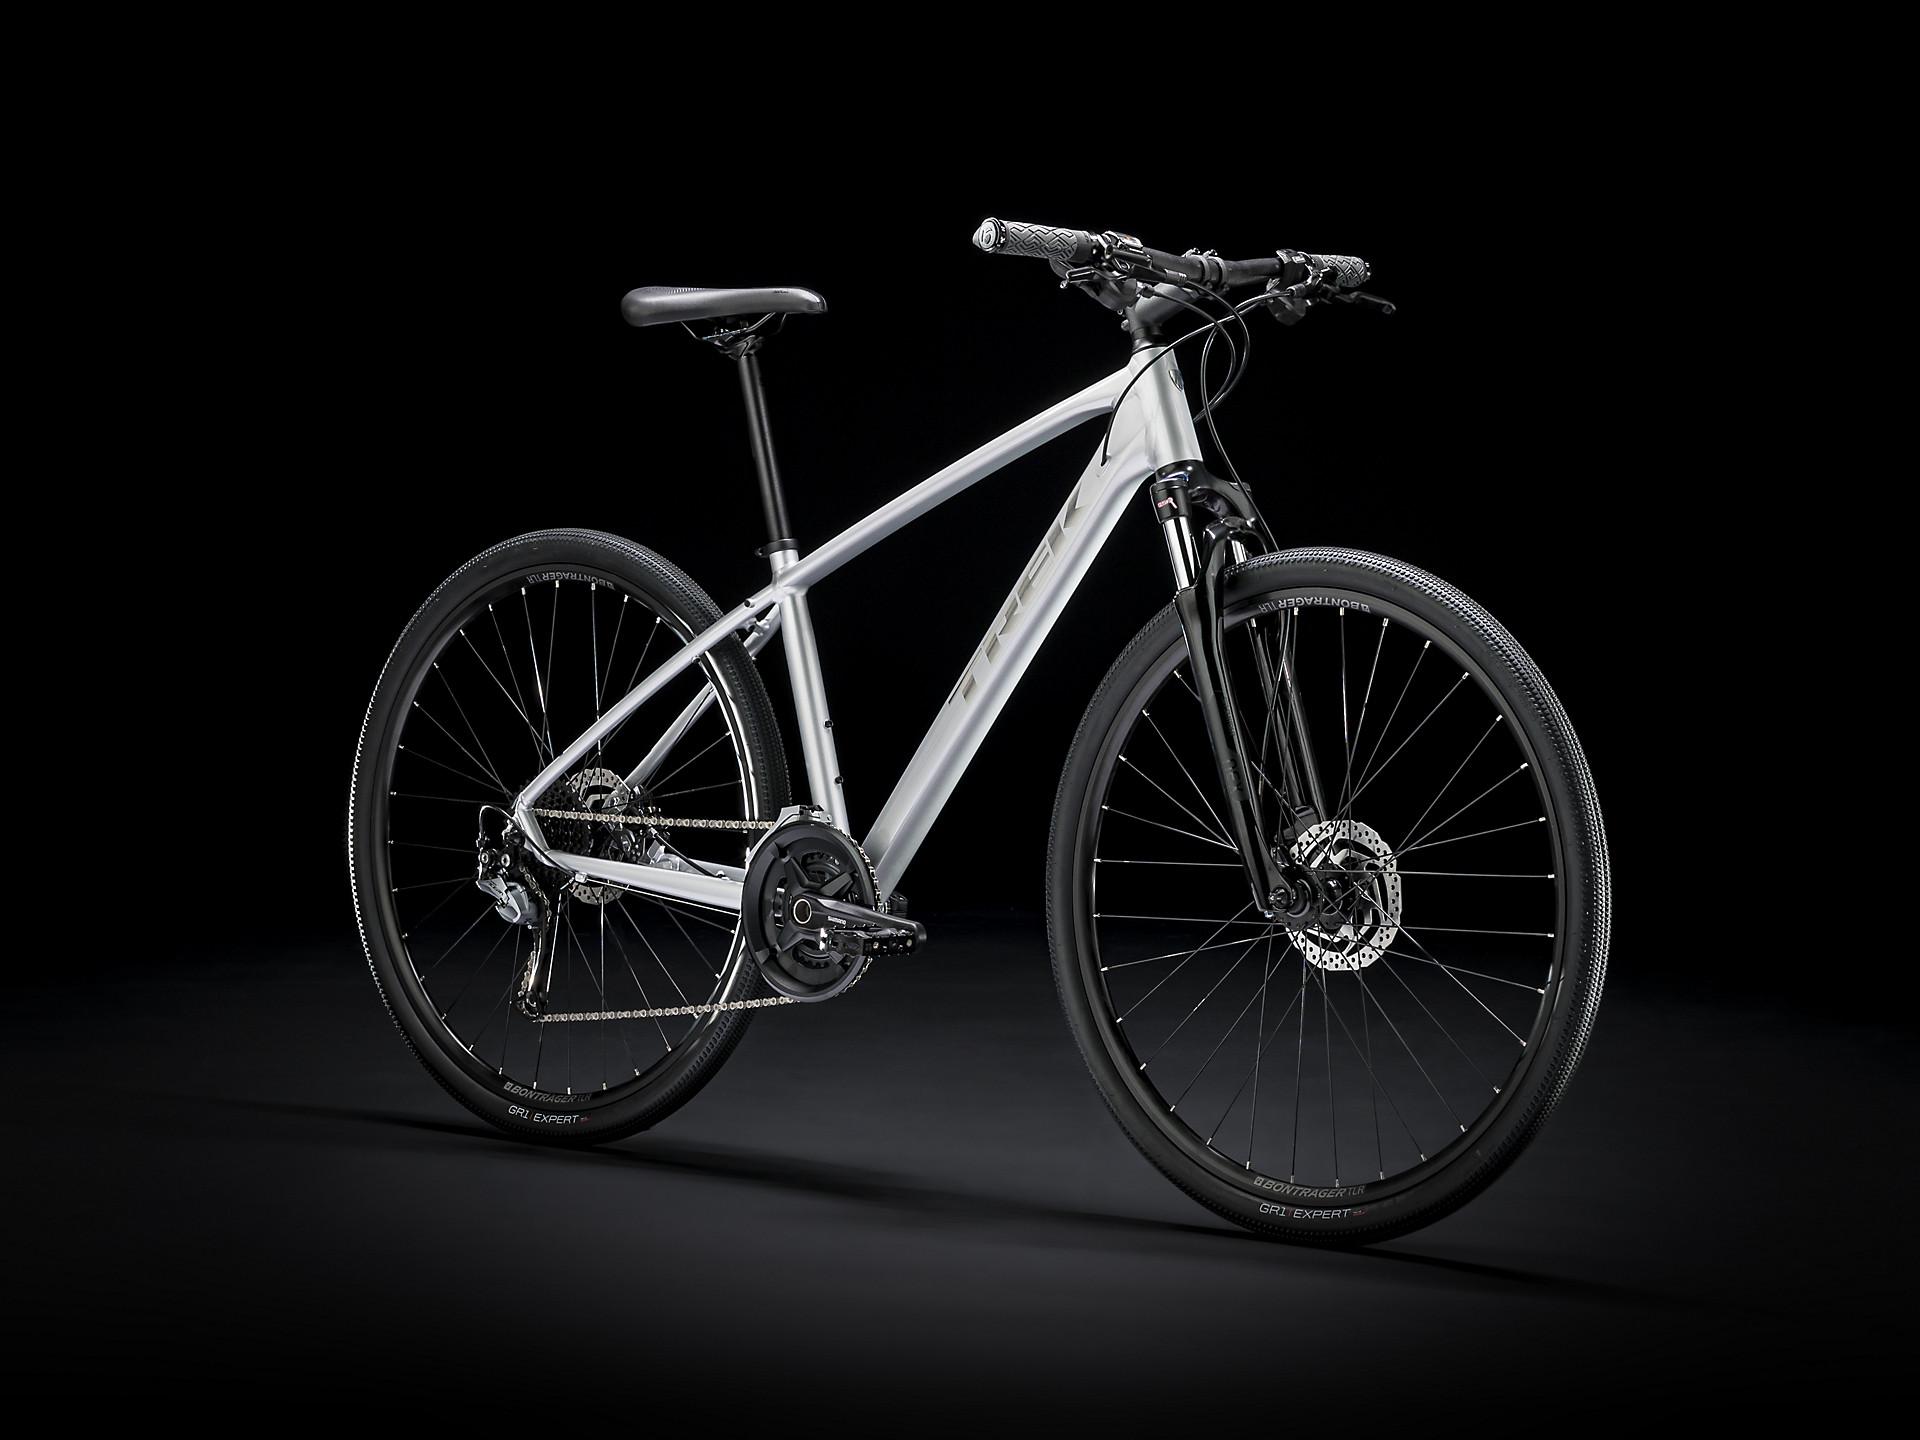 Trek Dual Sport 3 Hybrid Bikes